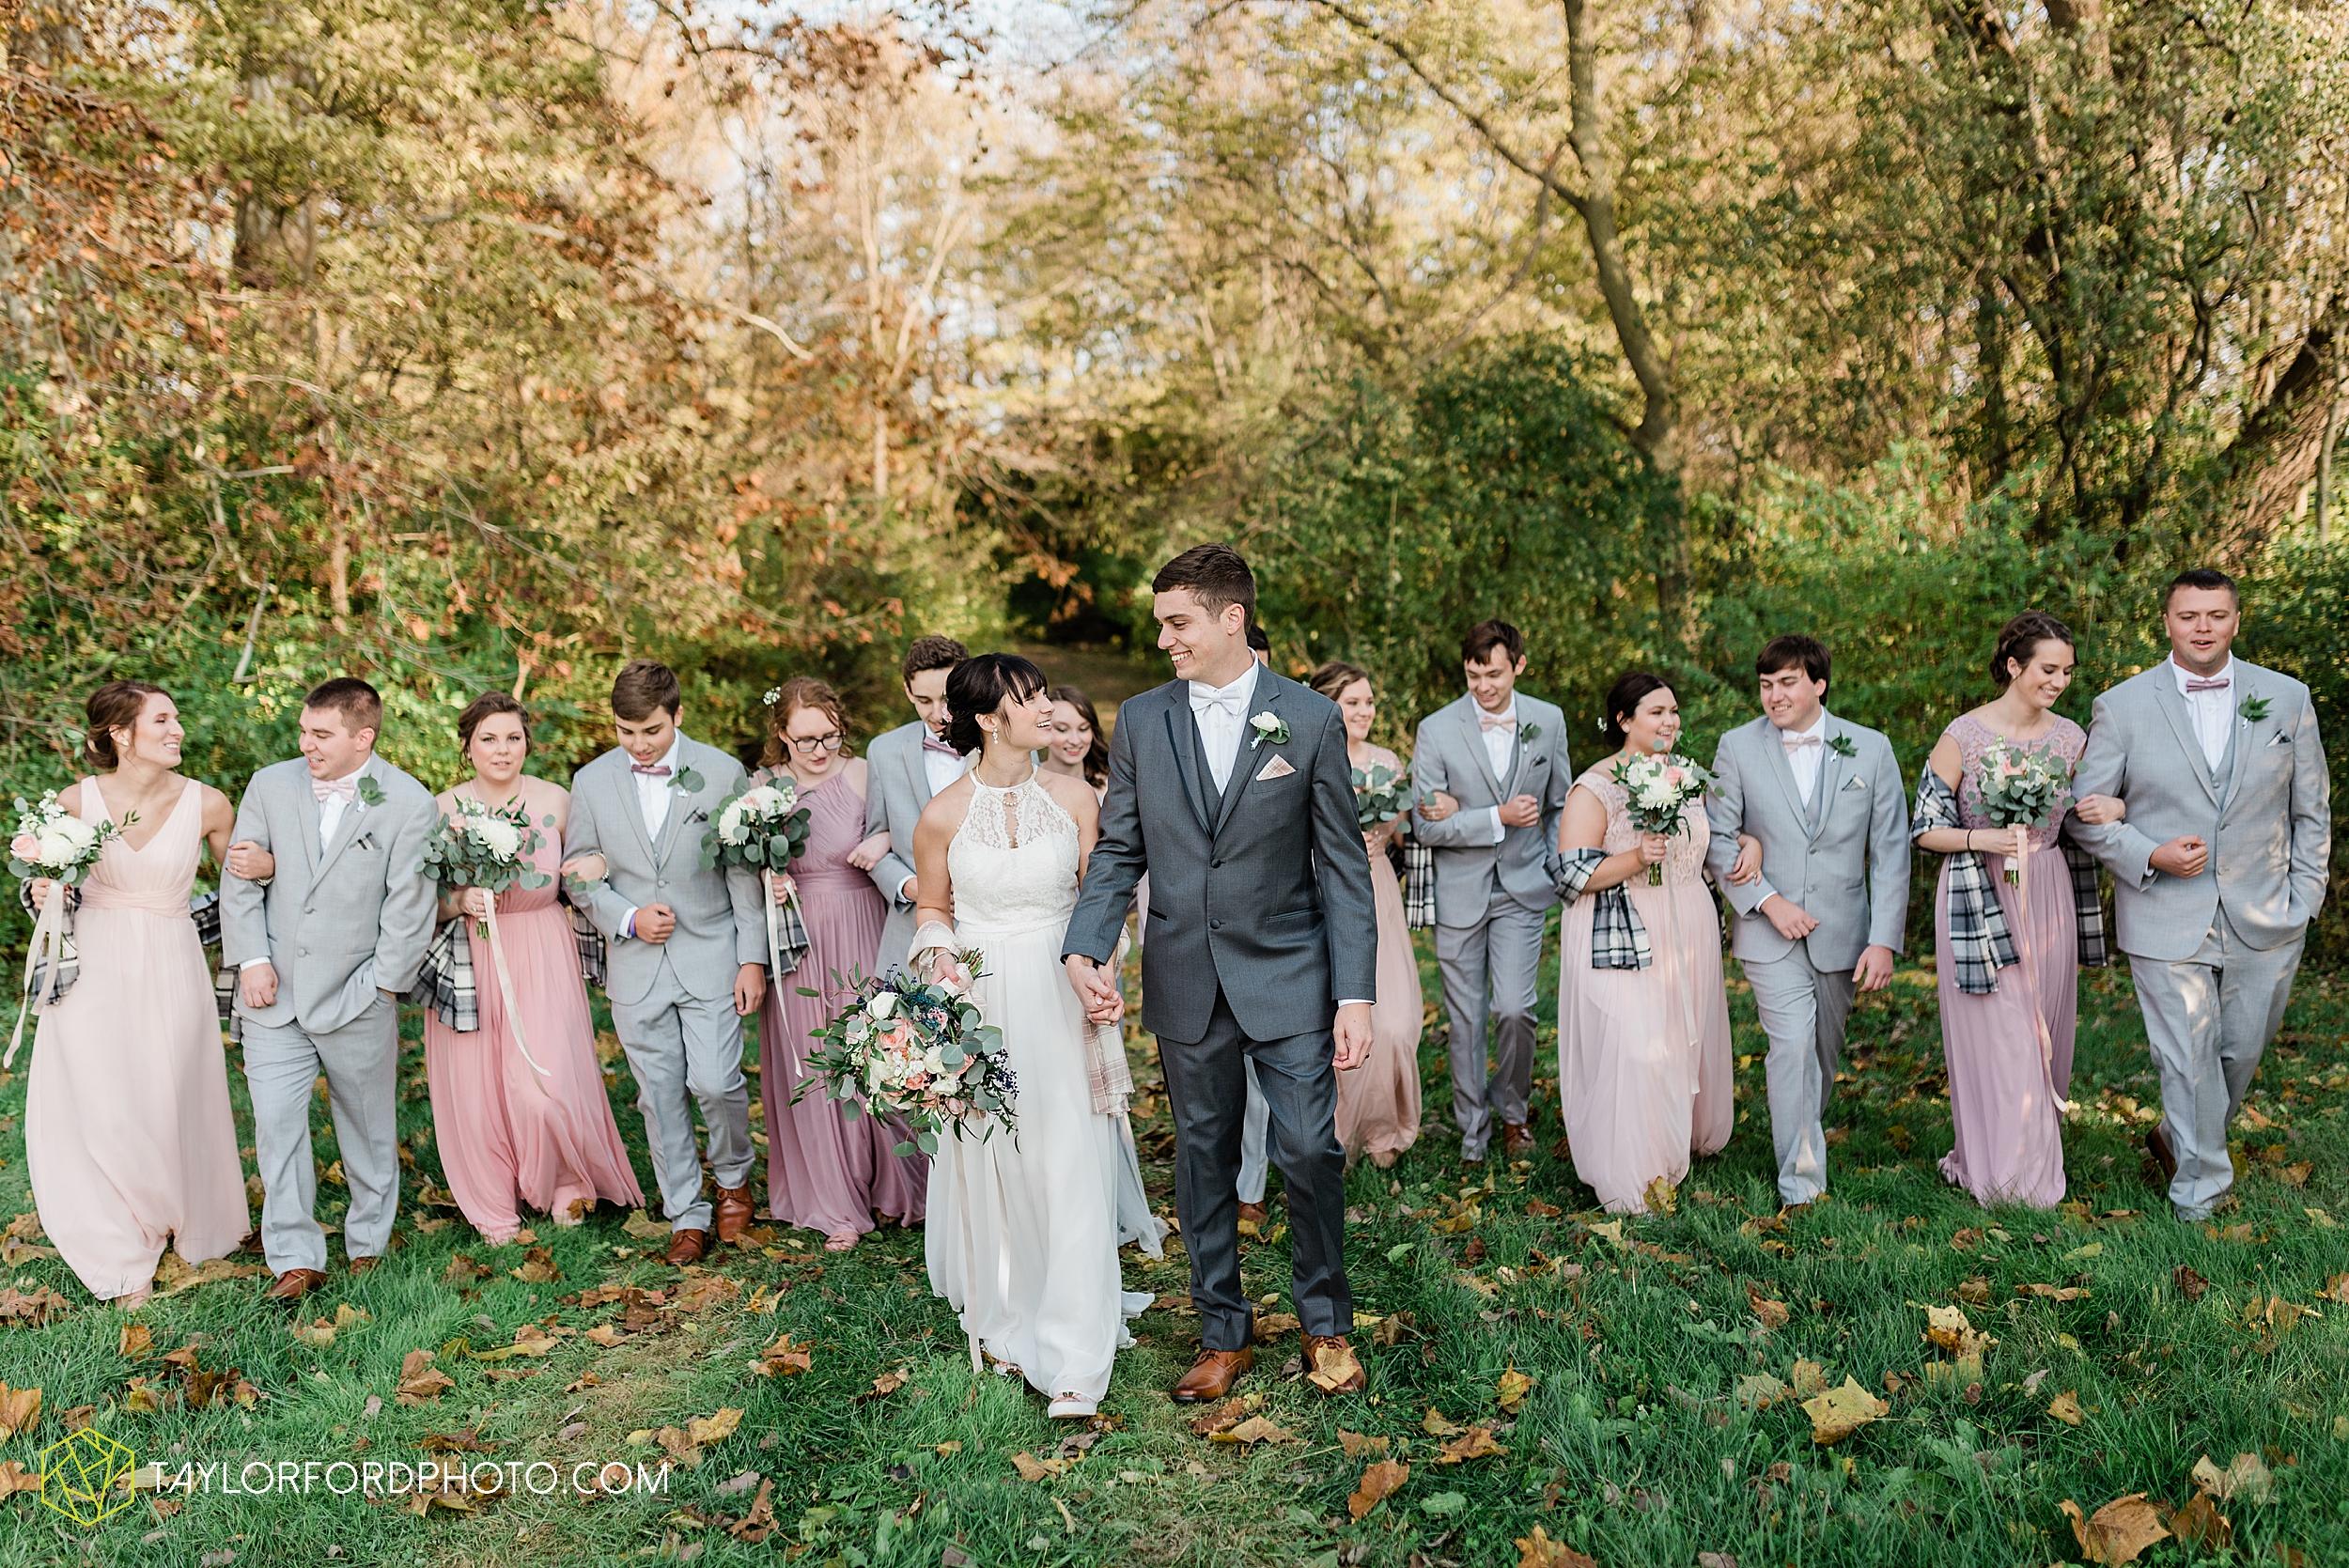 marissa-nicole-nick-daeger-orrmont-estate-farm-wedding-piqua-dayton-troy-ohio-fall-photographer-taylor-ford-photography_1535.jpg